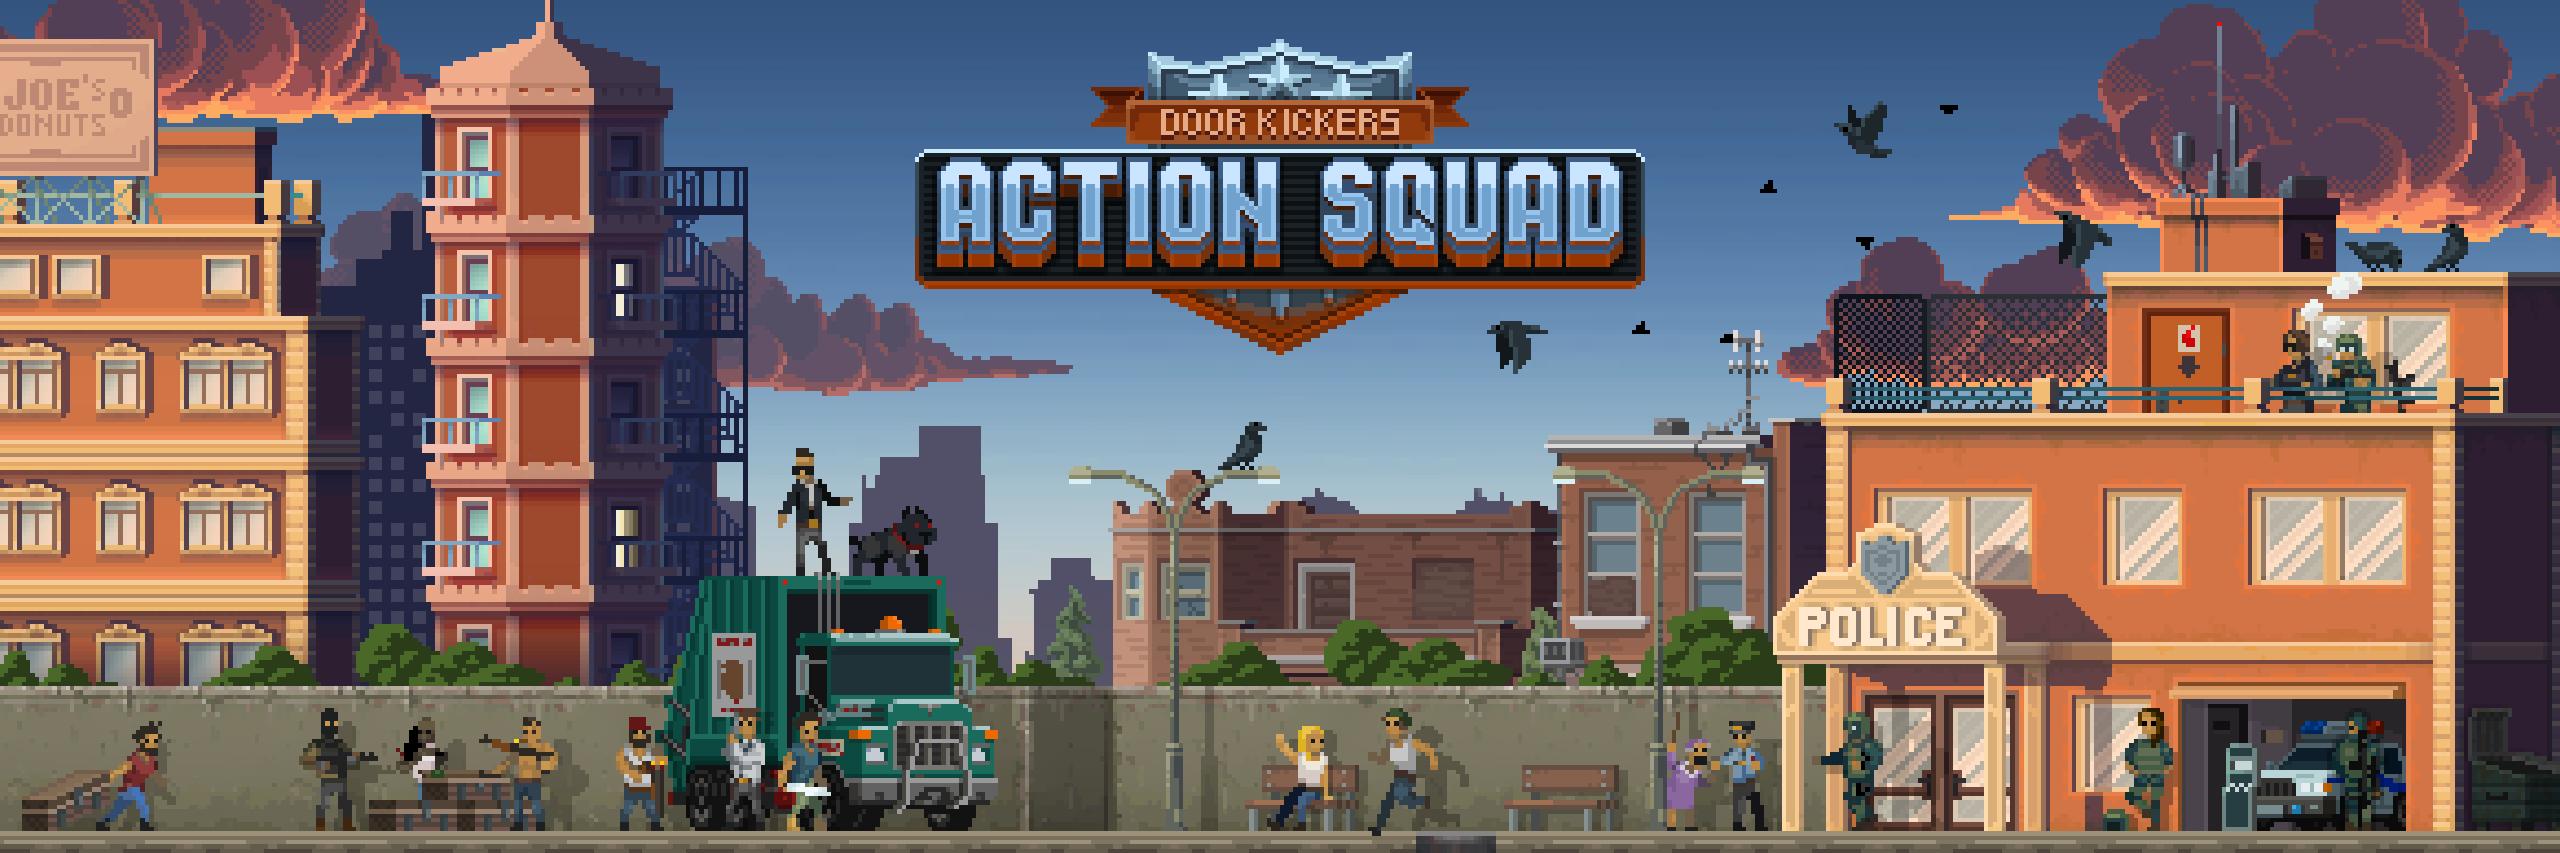 Action squad logo